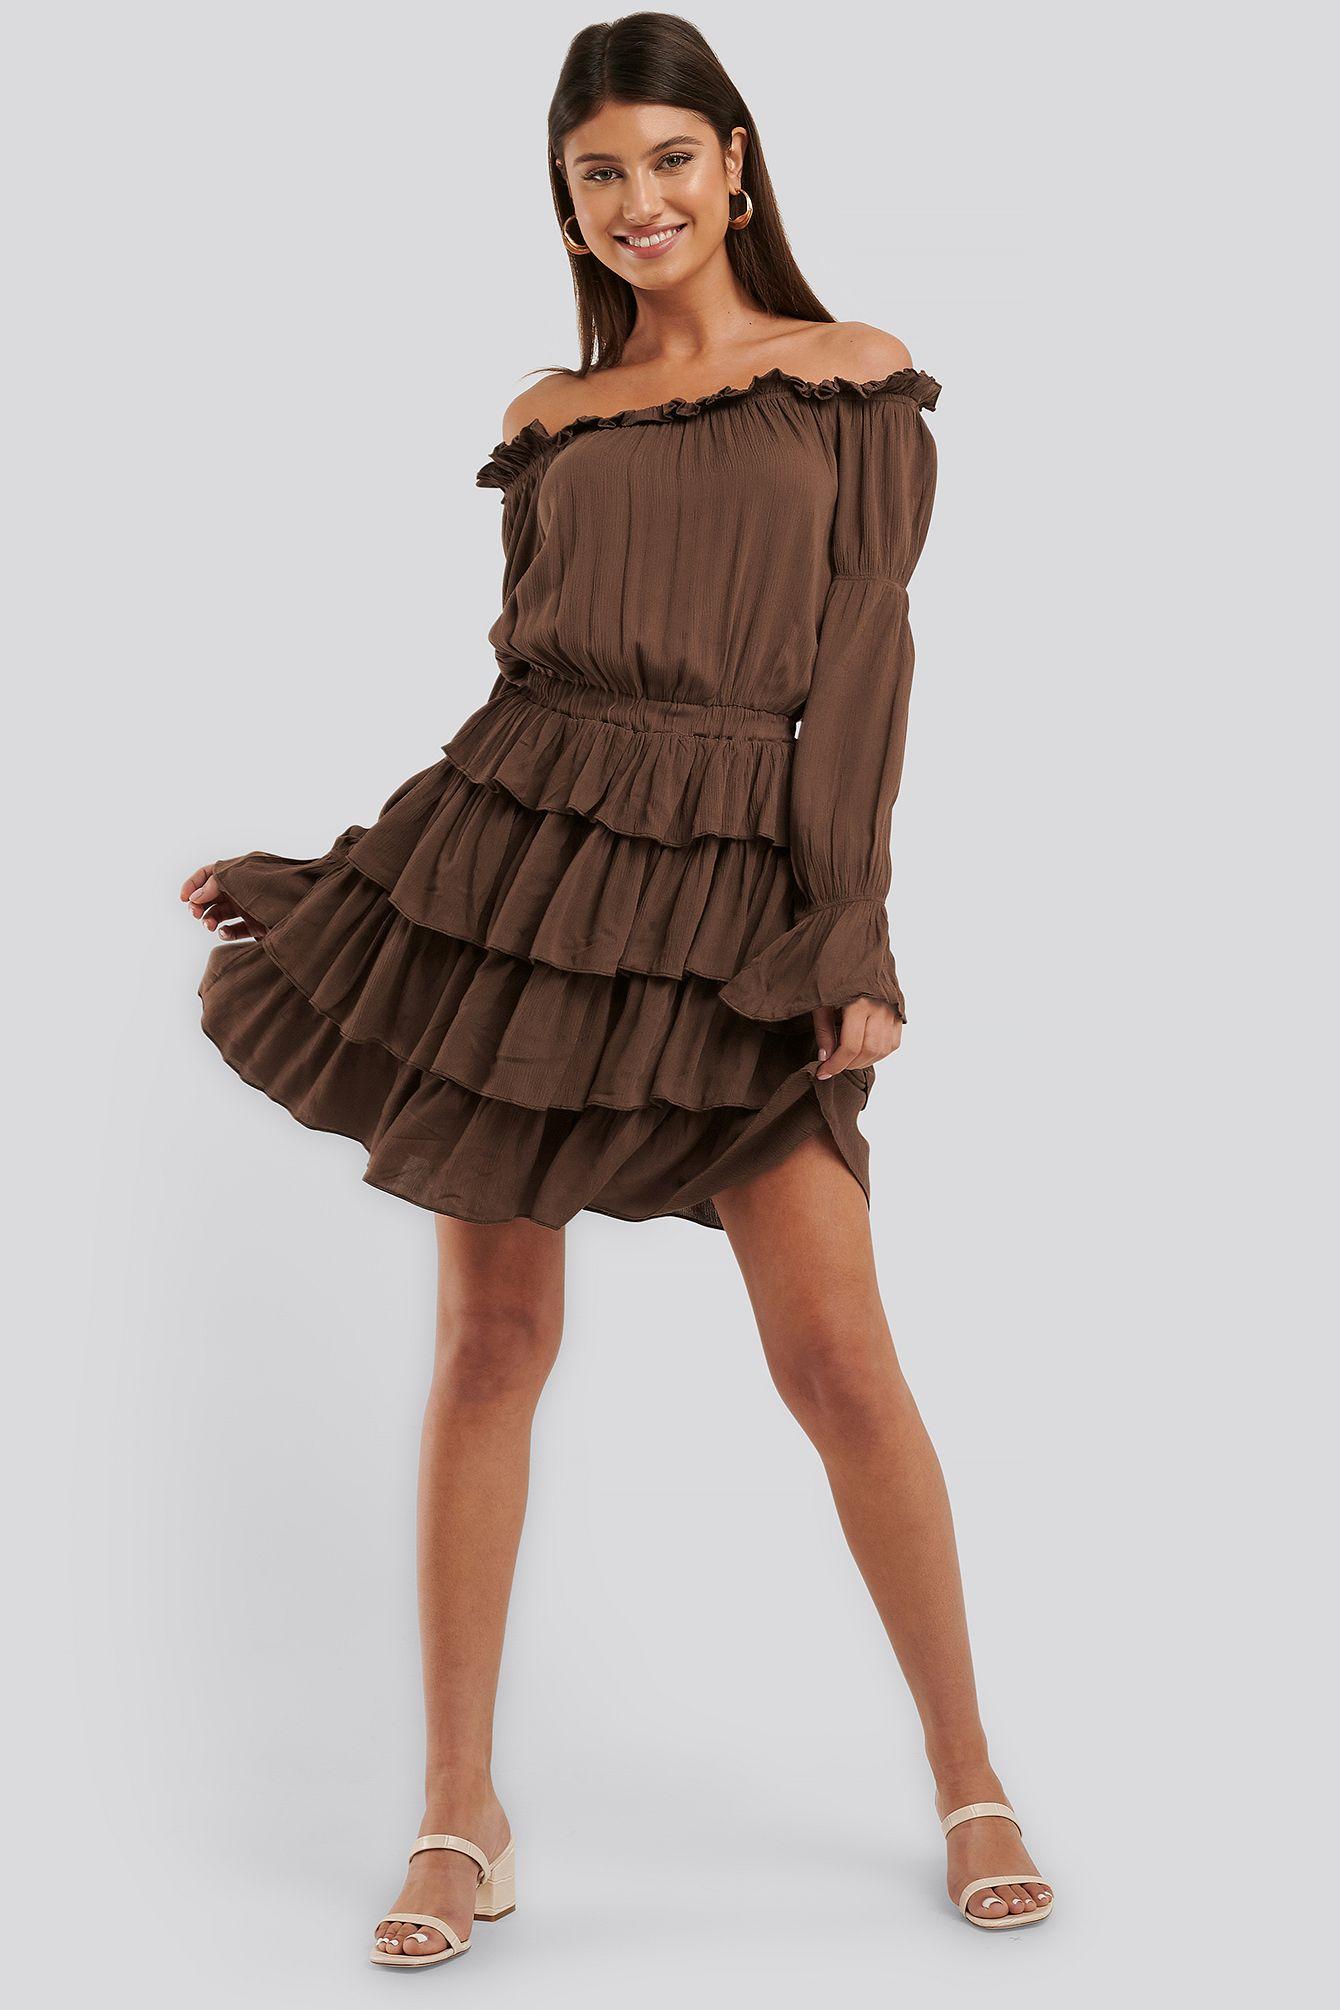 NA-KD OFF SHOULDER LAYER FRILL DRESS - BROWN. #na-kd #cloth in